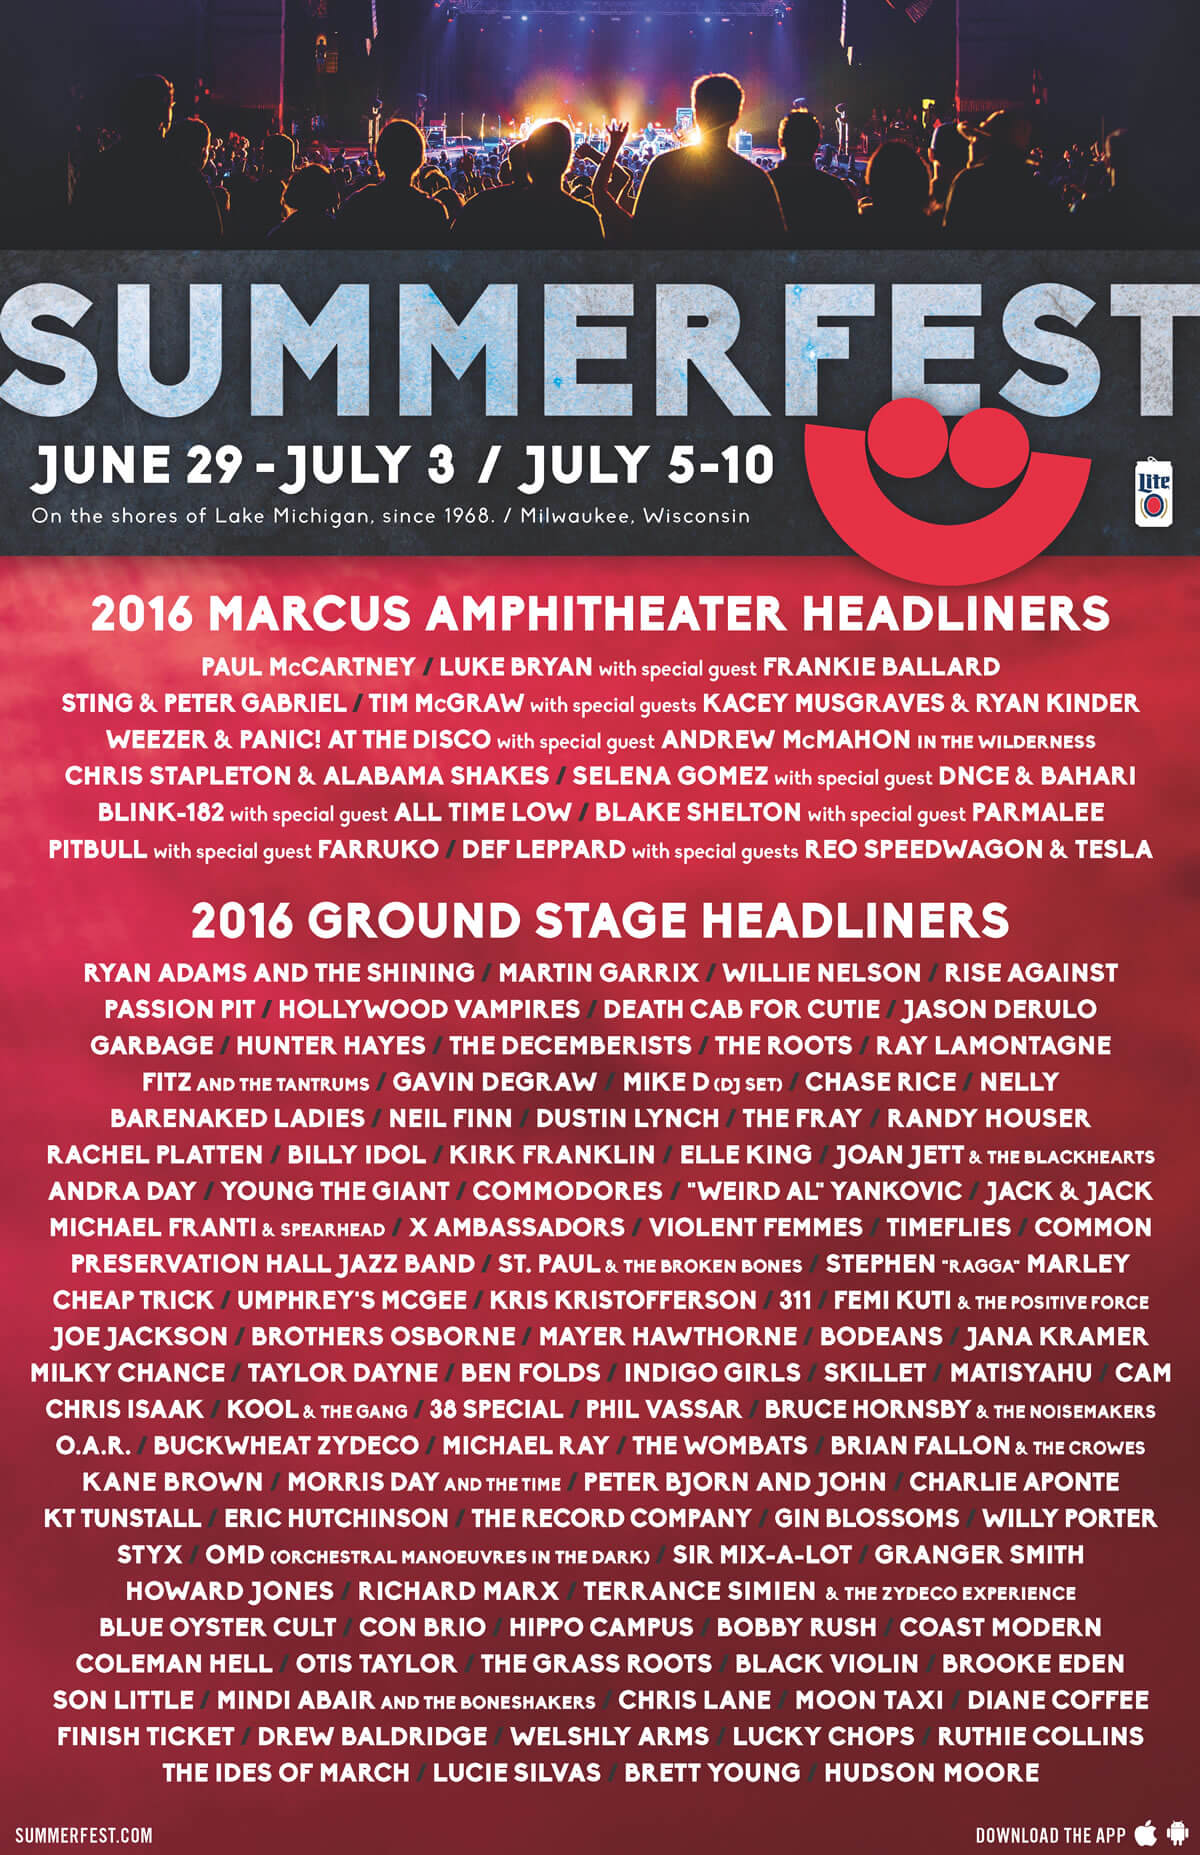 2016 Lineup | Summerfest, The World's Largest Music Festival